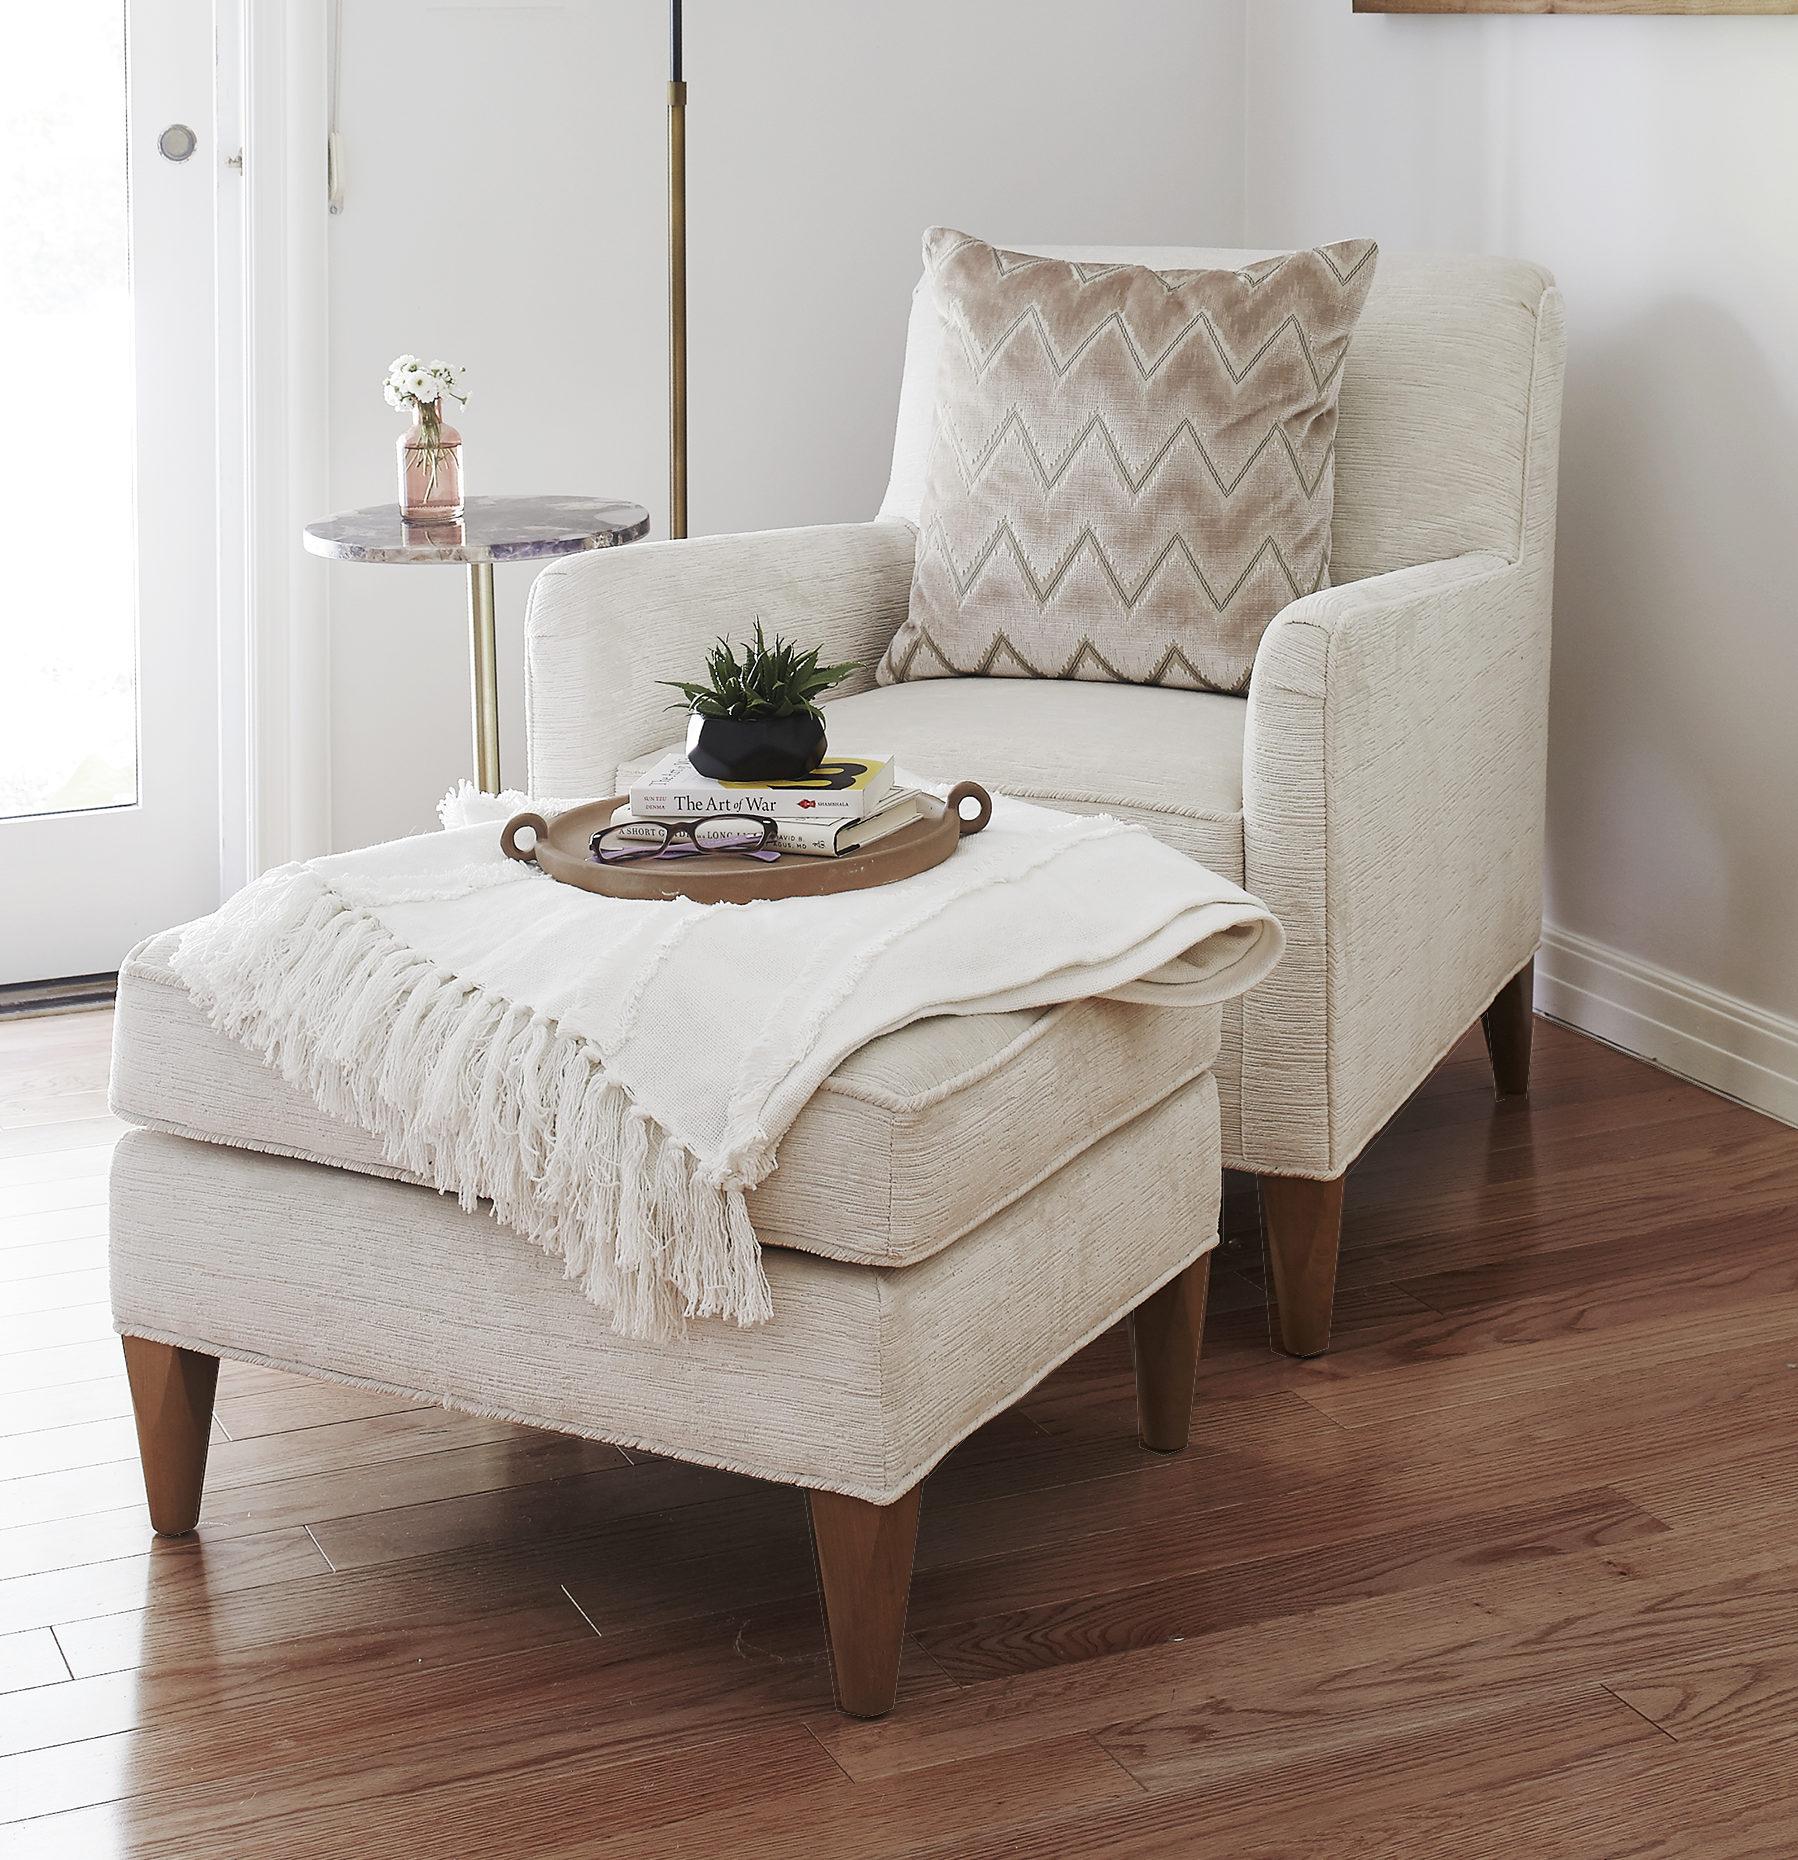 Sloane Chair and Ottoman